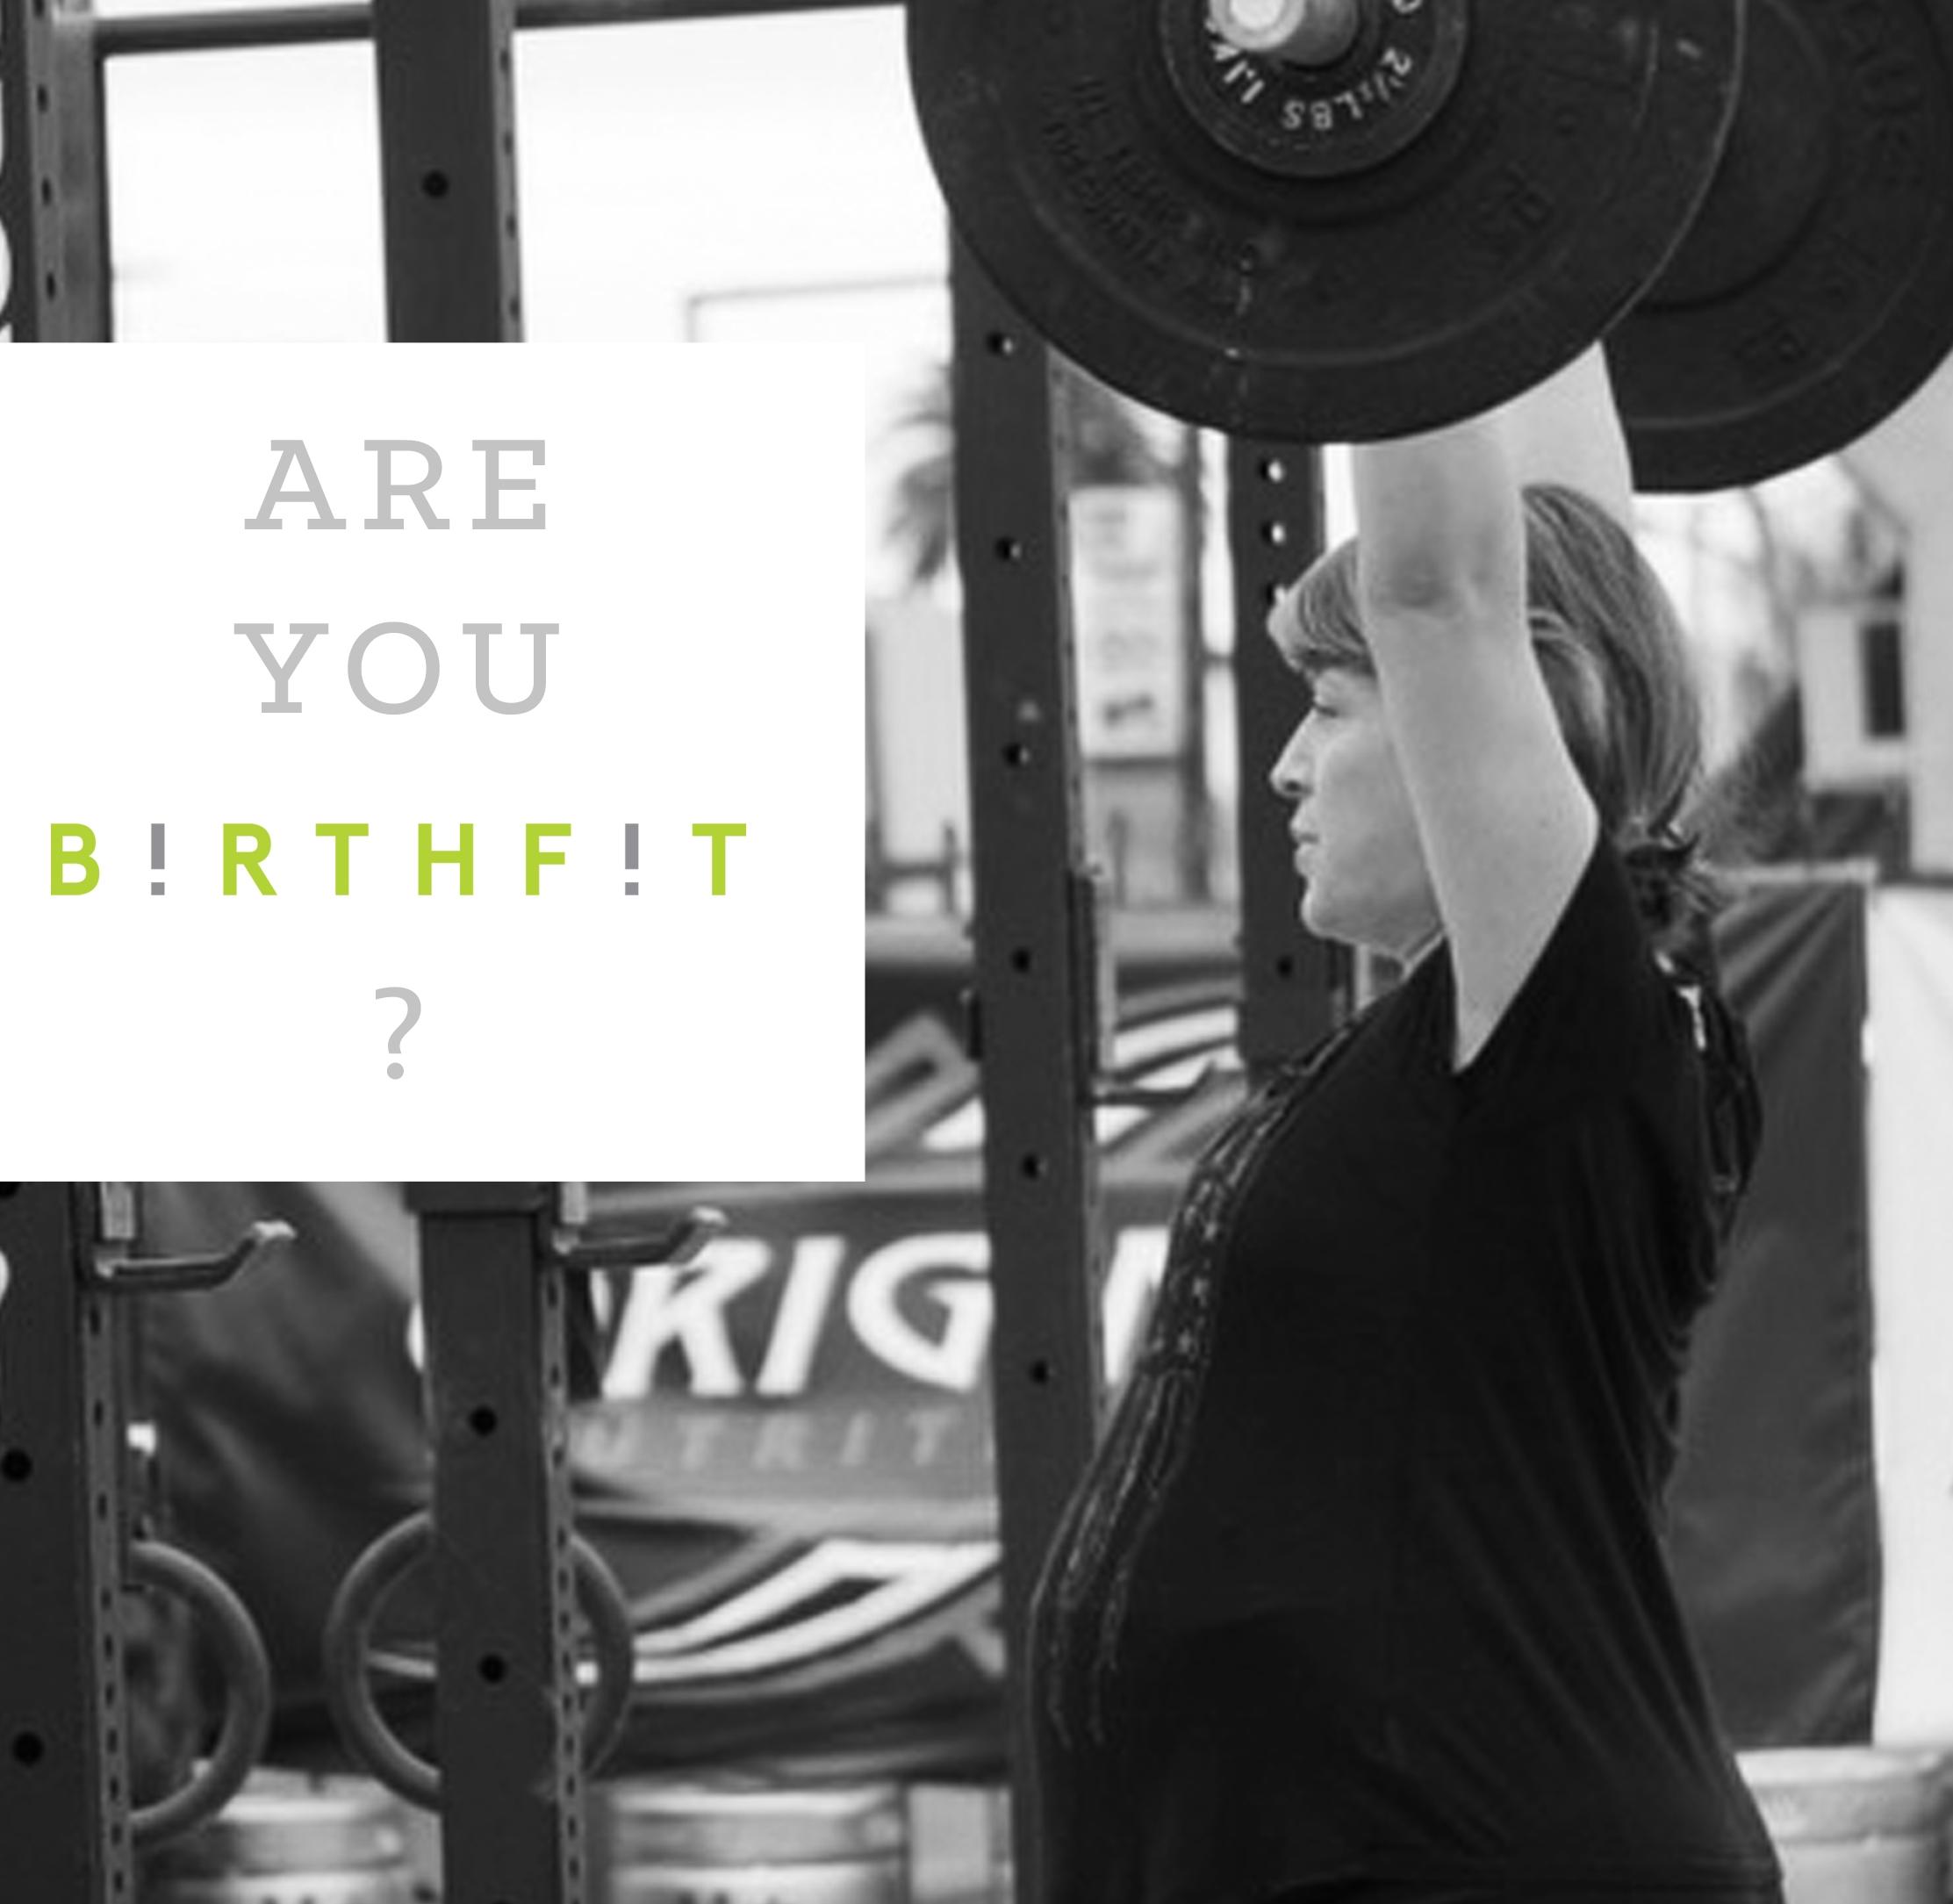 BF IG- Are You BIRTHFIT .jpg